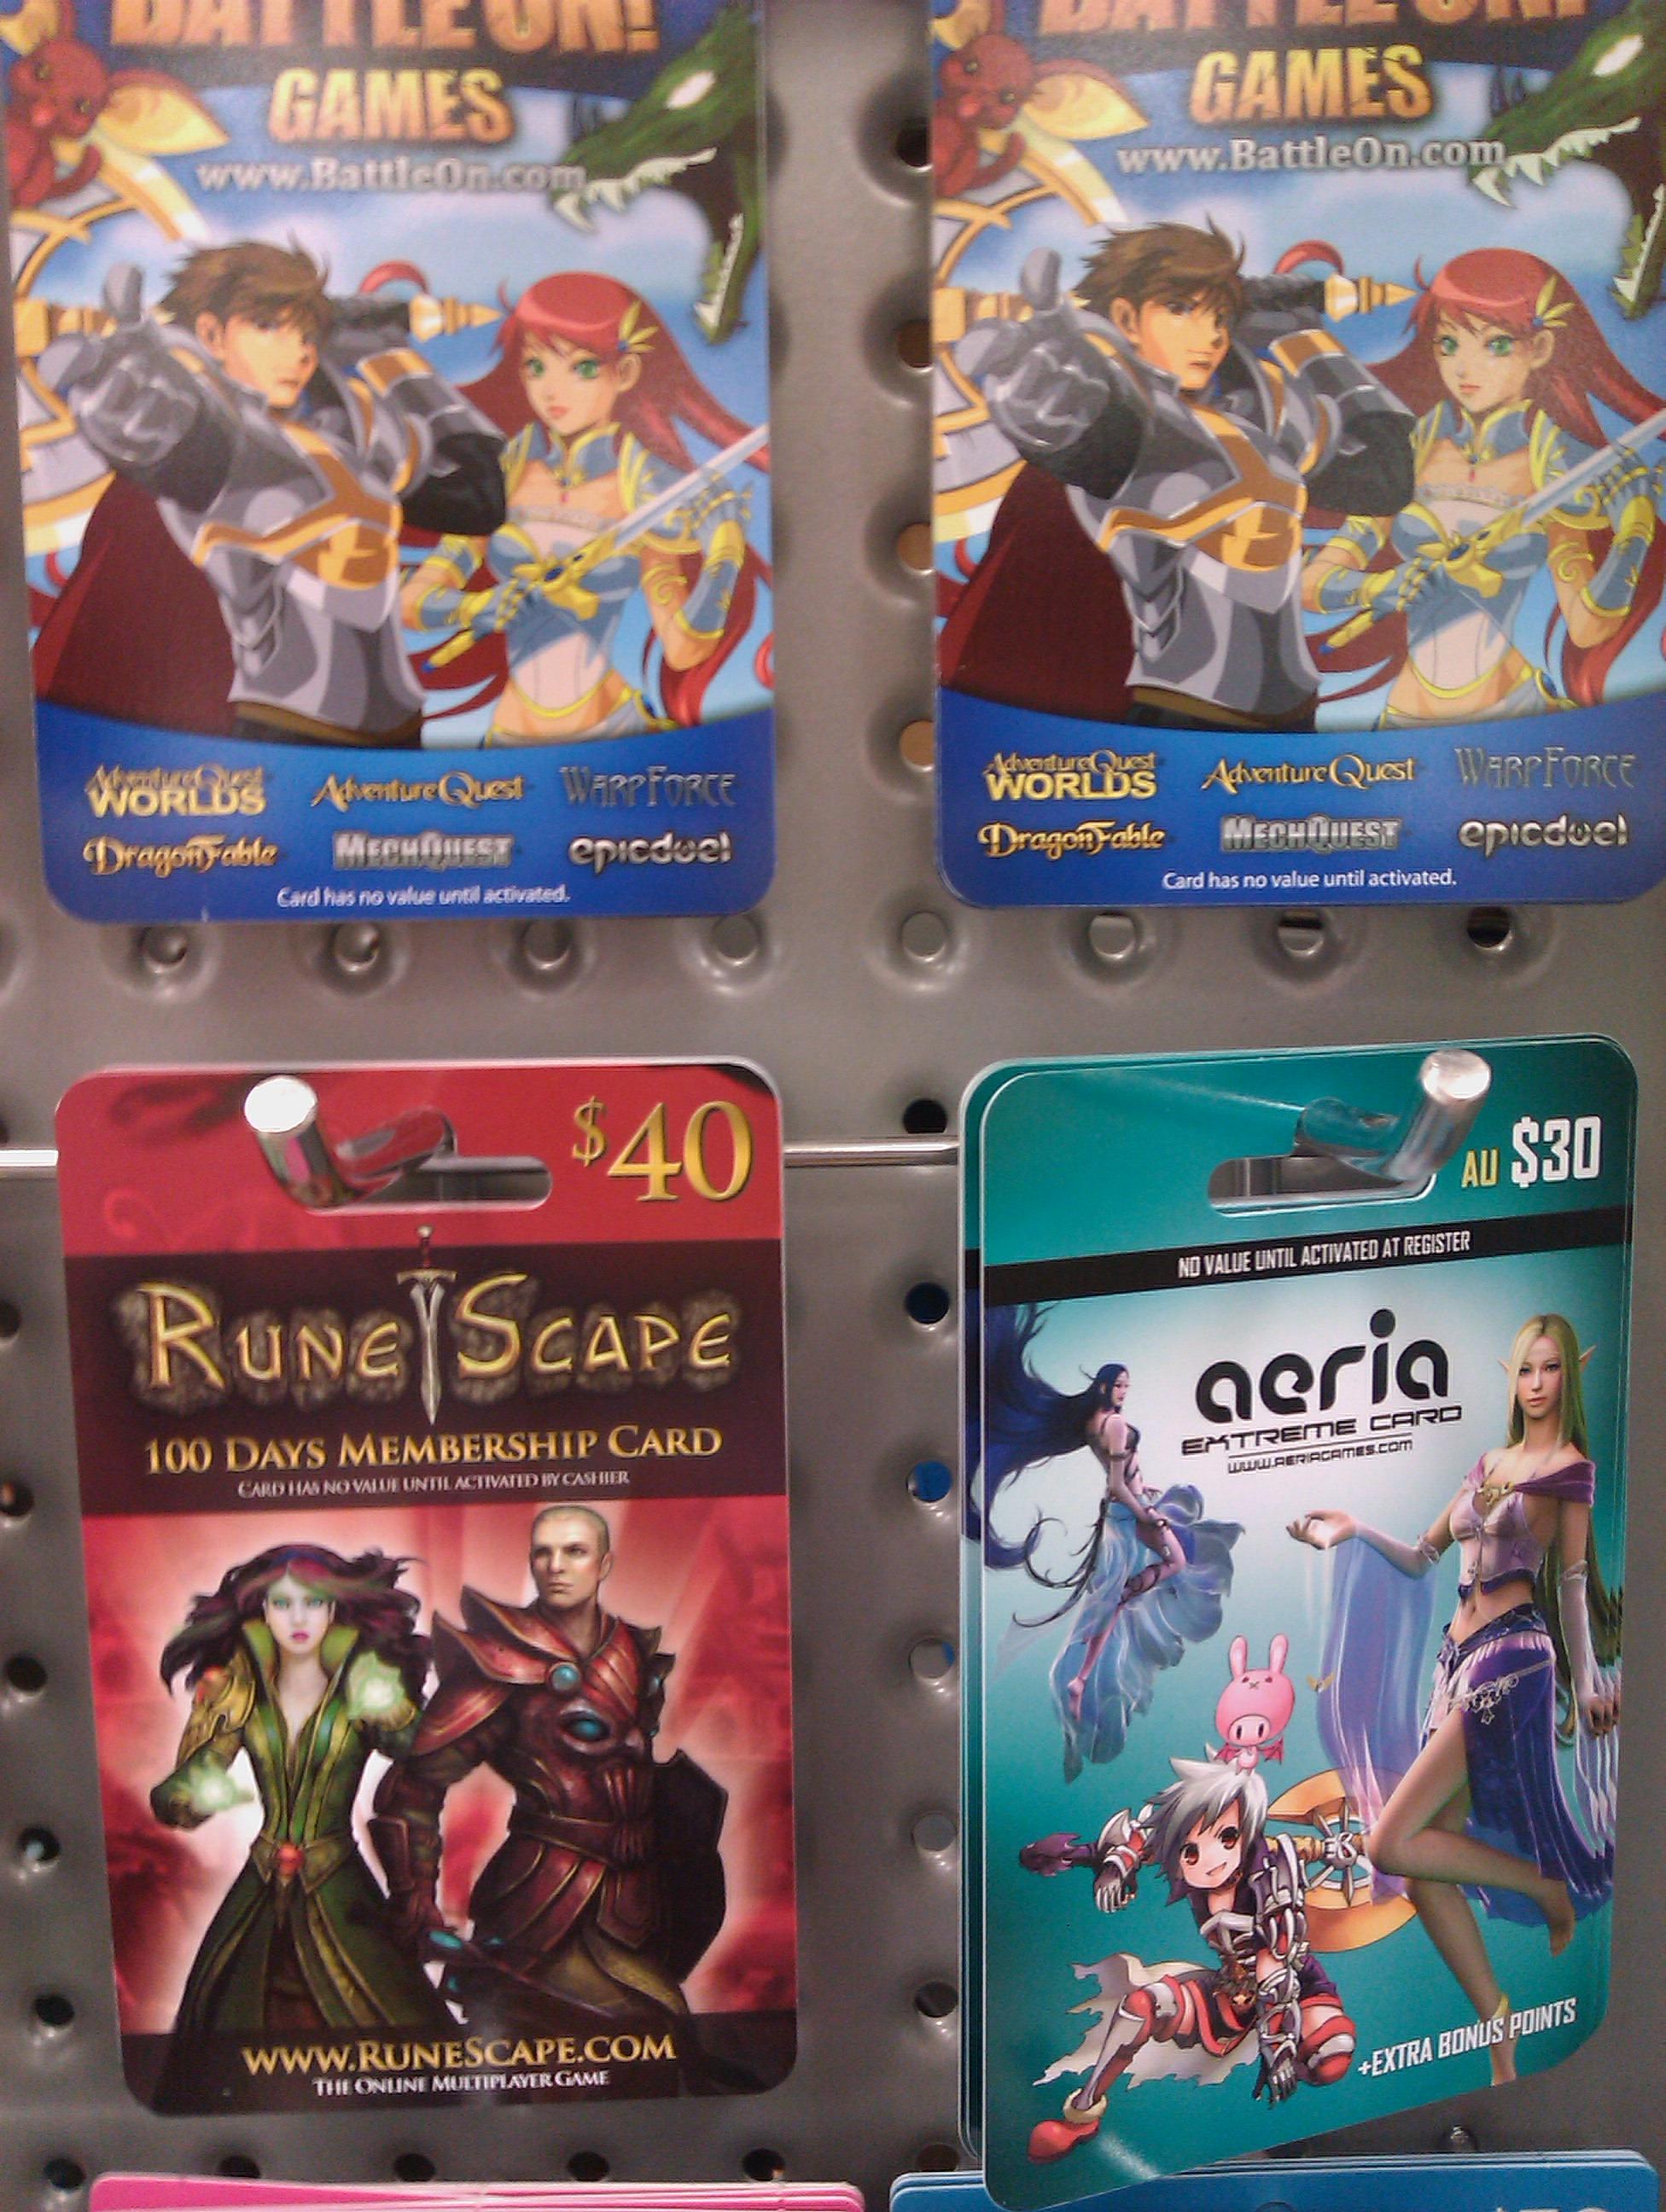 Gaming Prepaid Cards